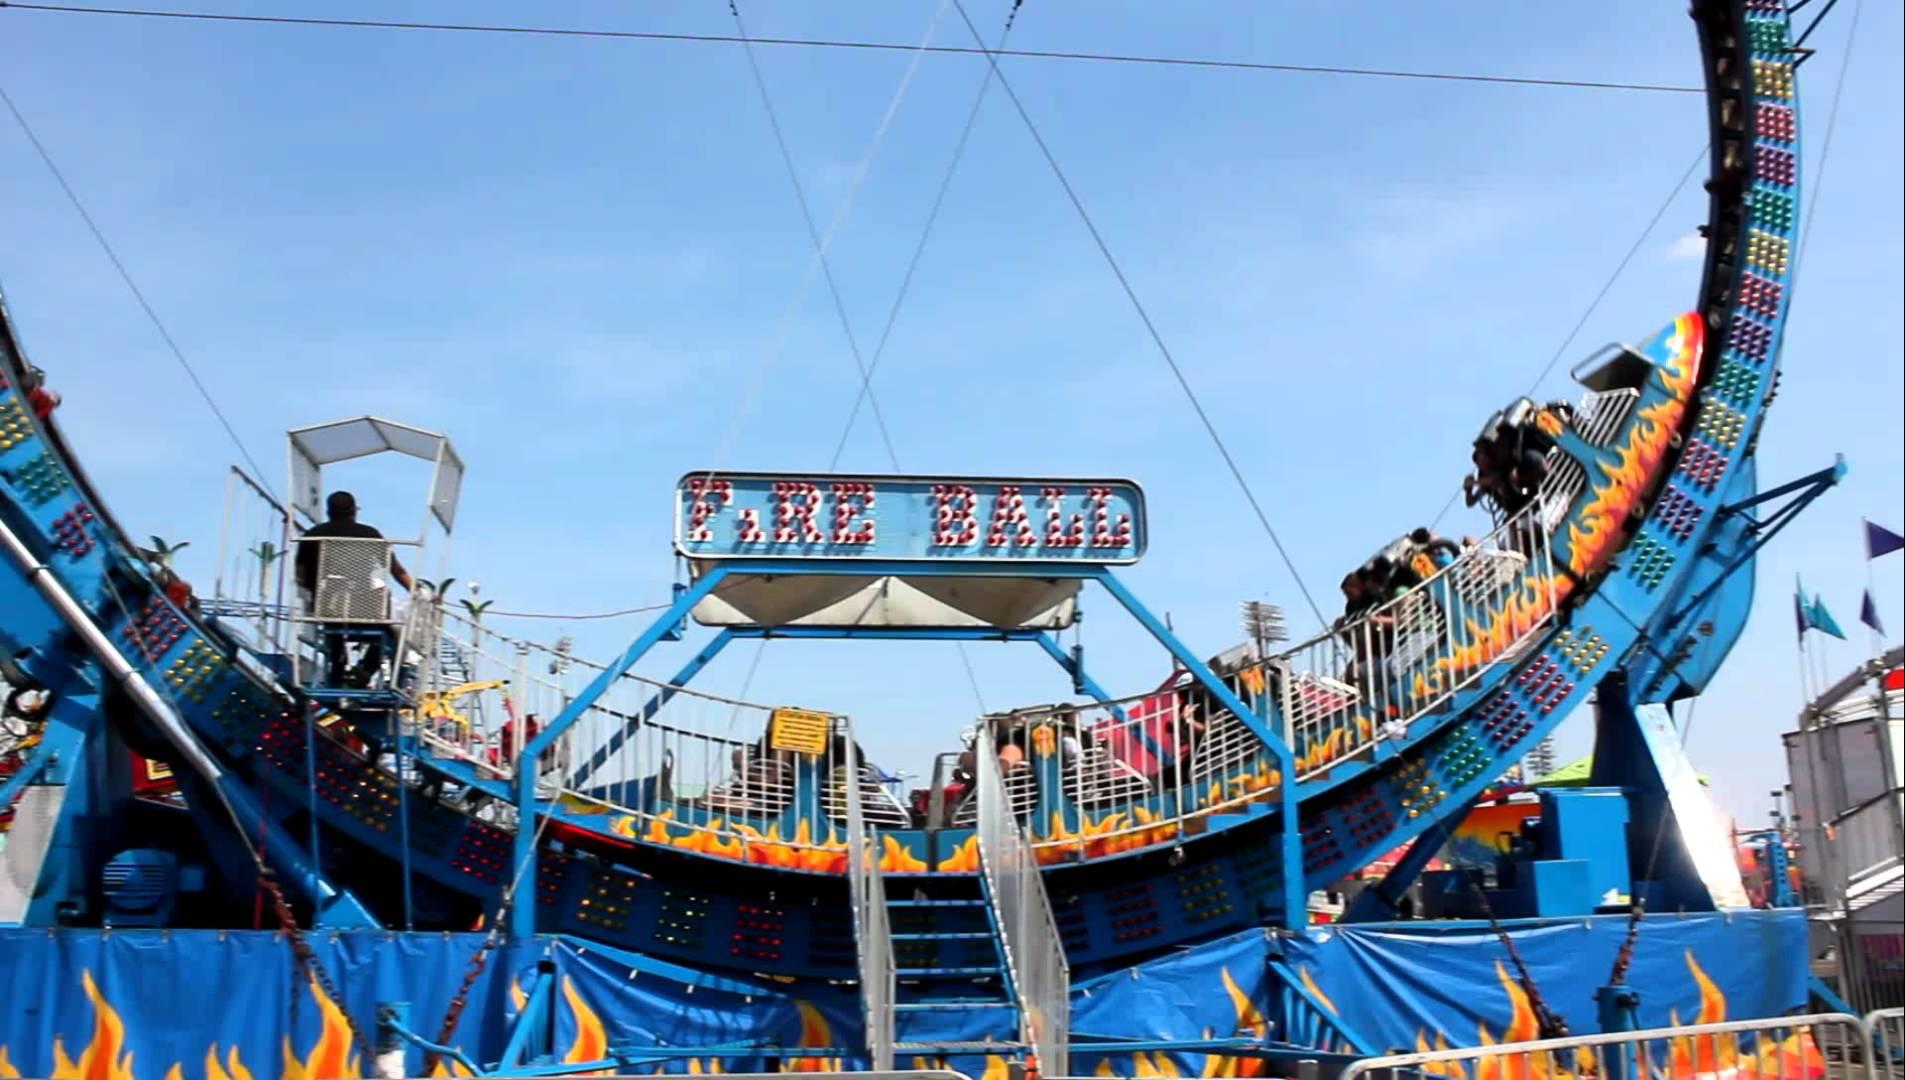 Fire Ball ride at the fair - YouTube